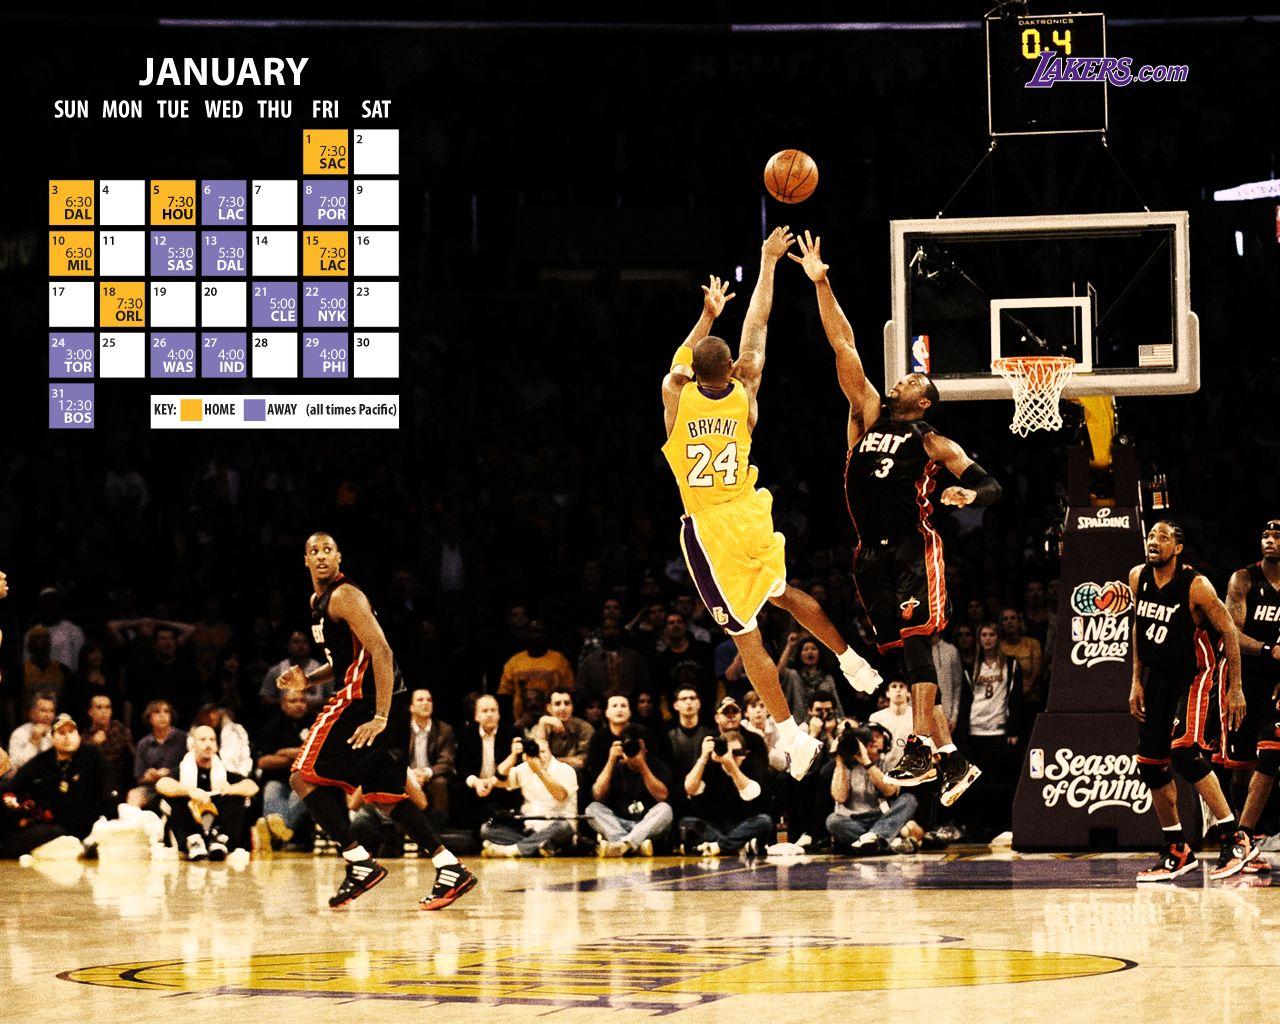 Loading Basketball Camp Kobe Lebron James Wallpapers